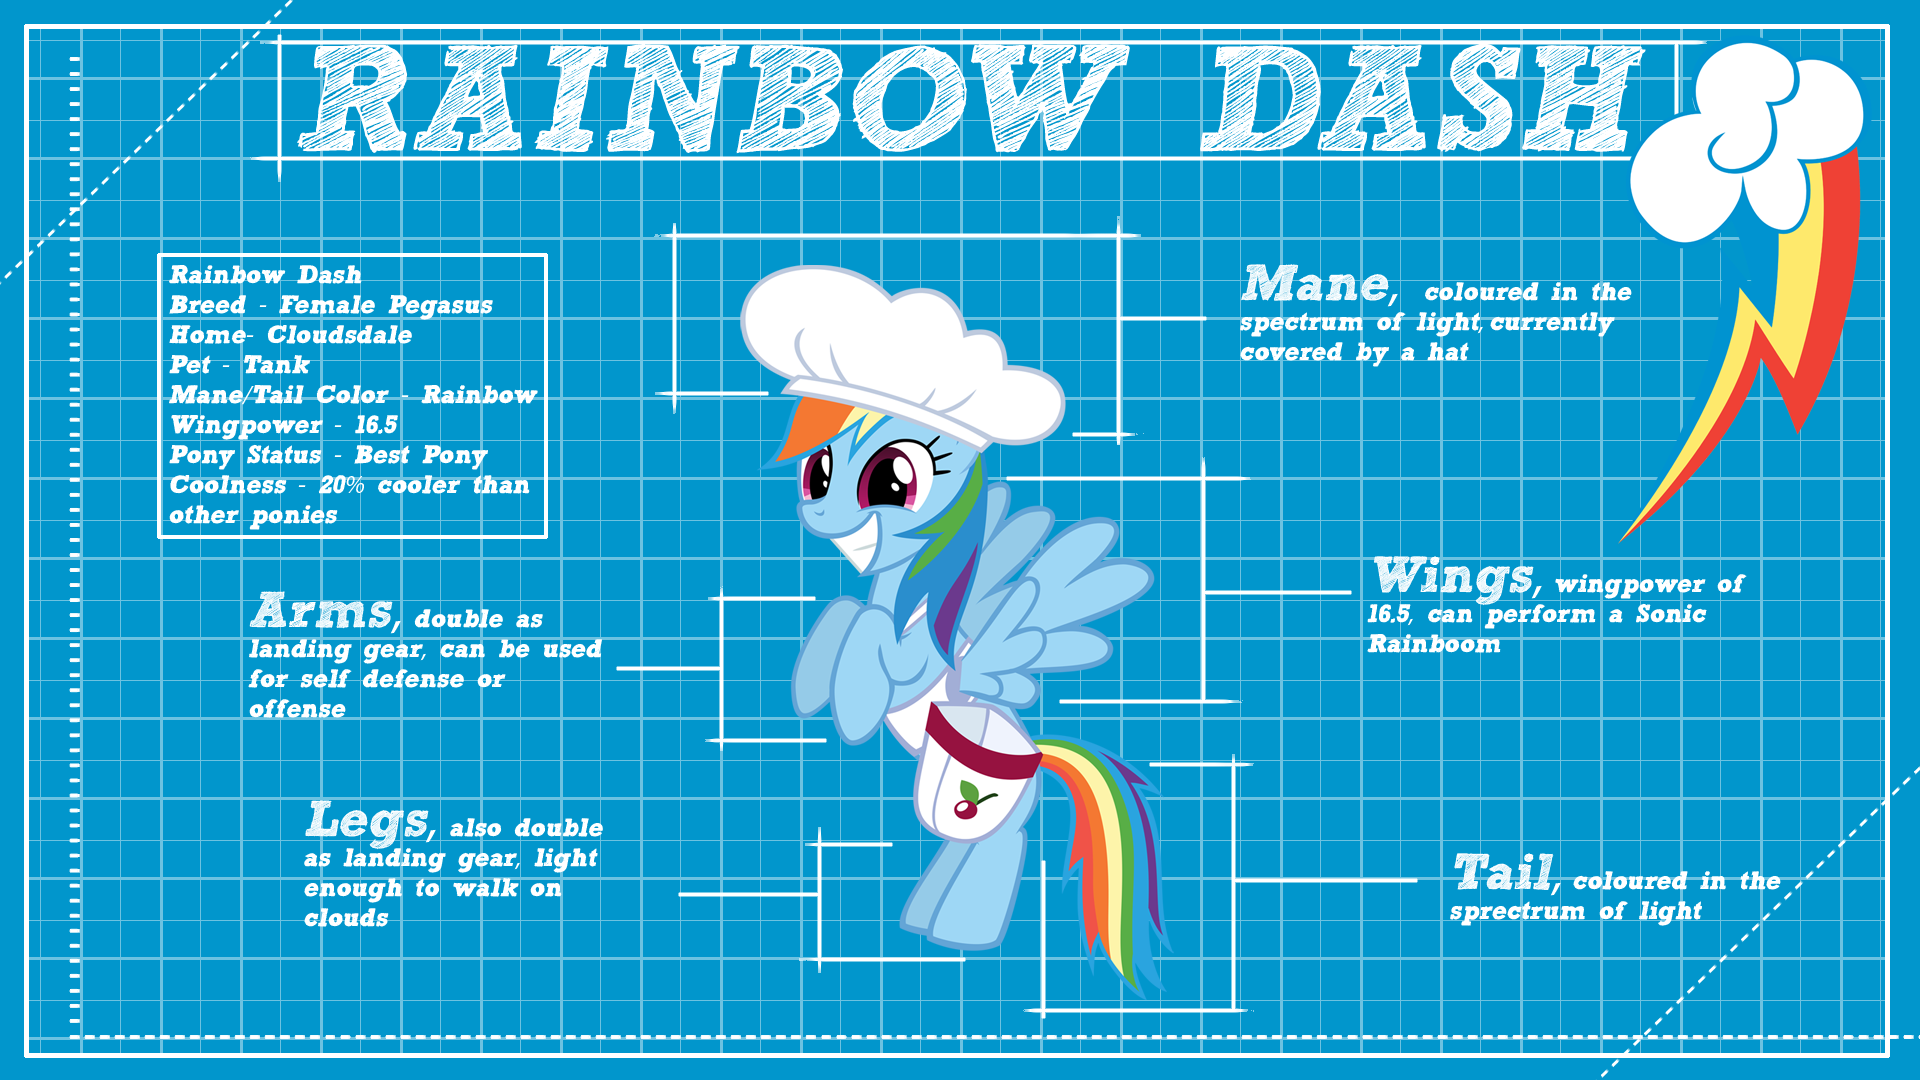 Rainbow Design by BlackGryph0n, CrusierPL and ikonradx